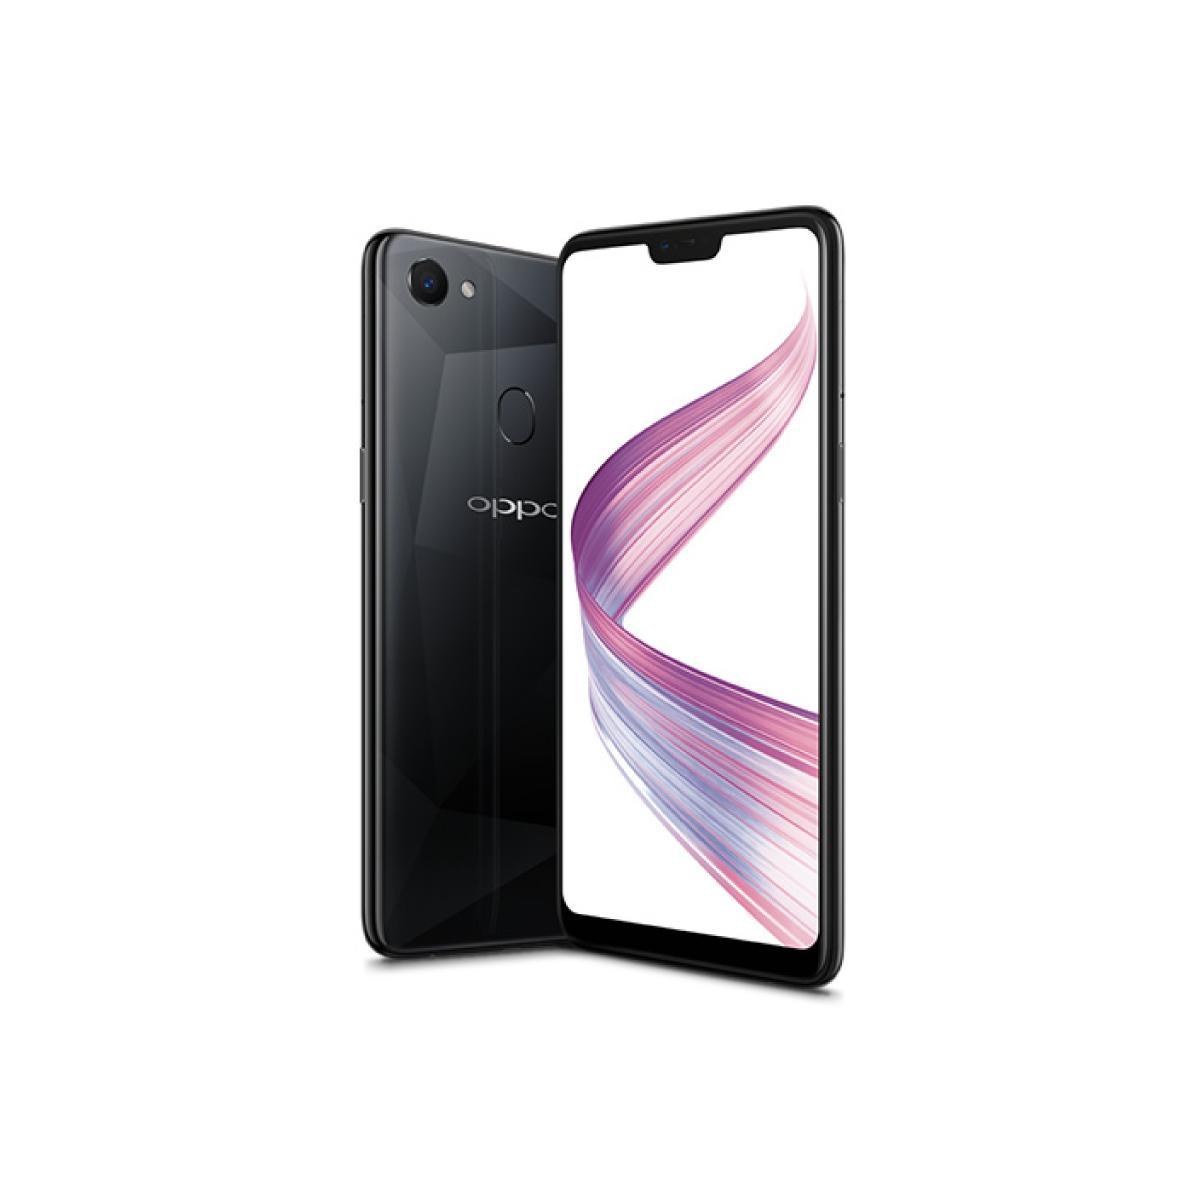 Jual Handphone Oppo Terbaru F1s Plus Ram 4gb Bekas F7 Smartphone 64gb Black Face Unlock Al